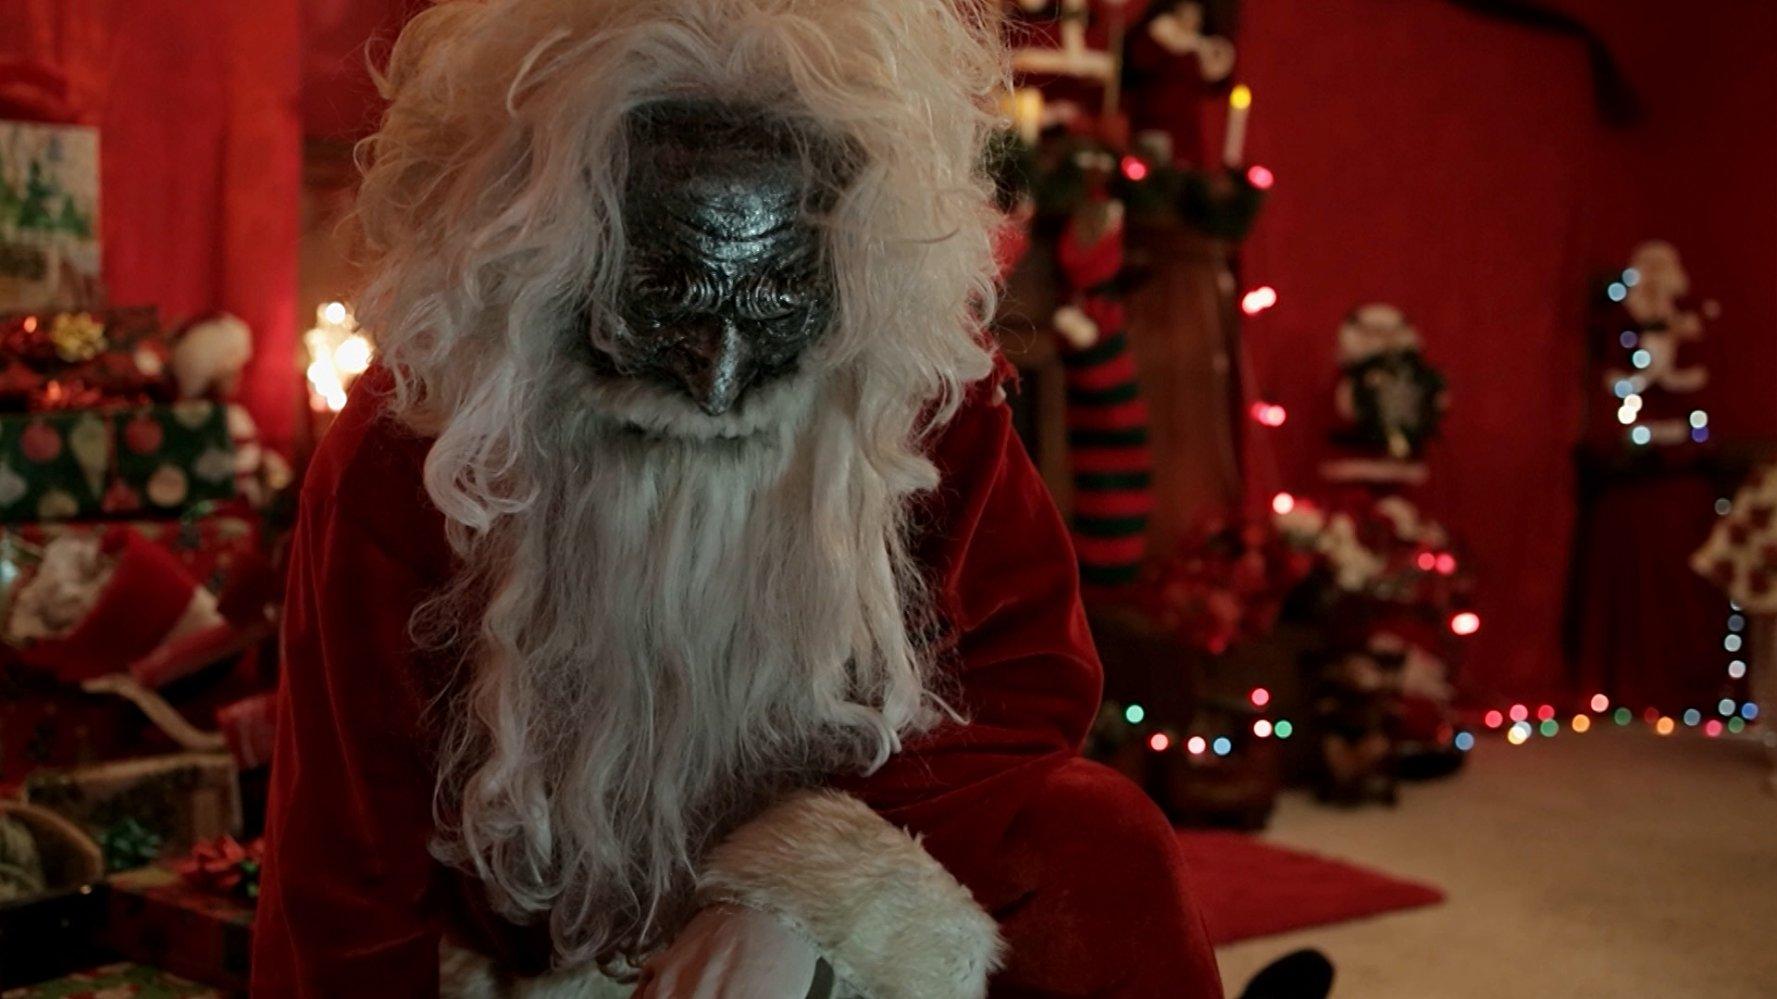 Psycho Santa (Lito Velasco) in All Through the House (2015)